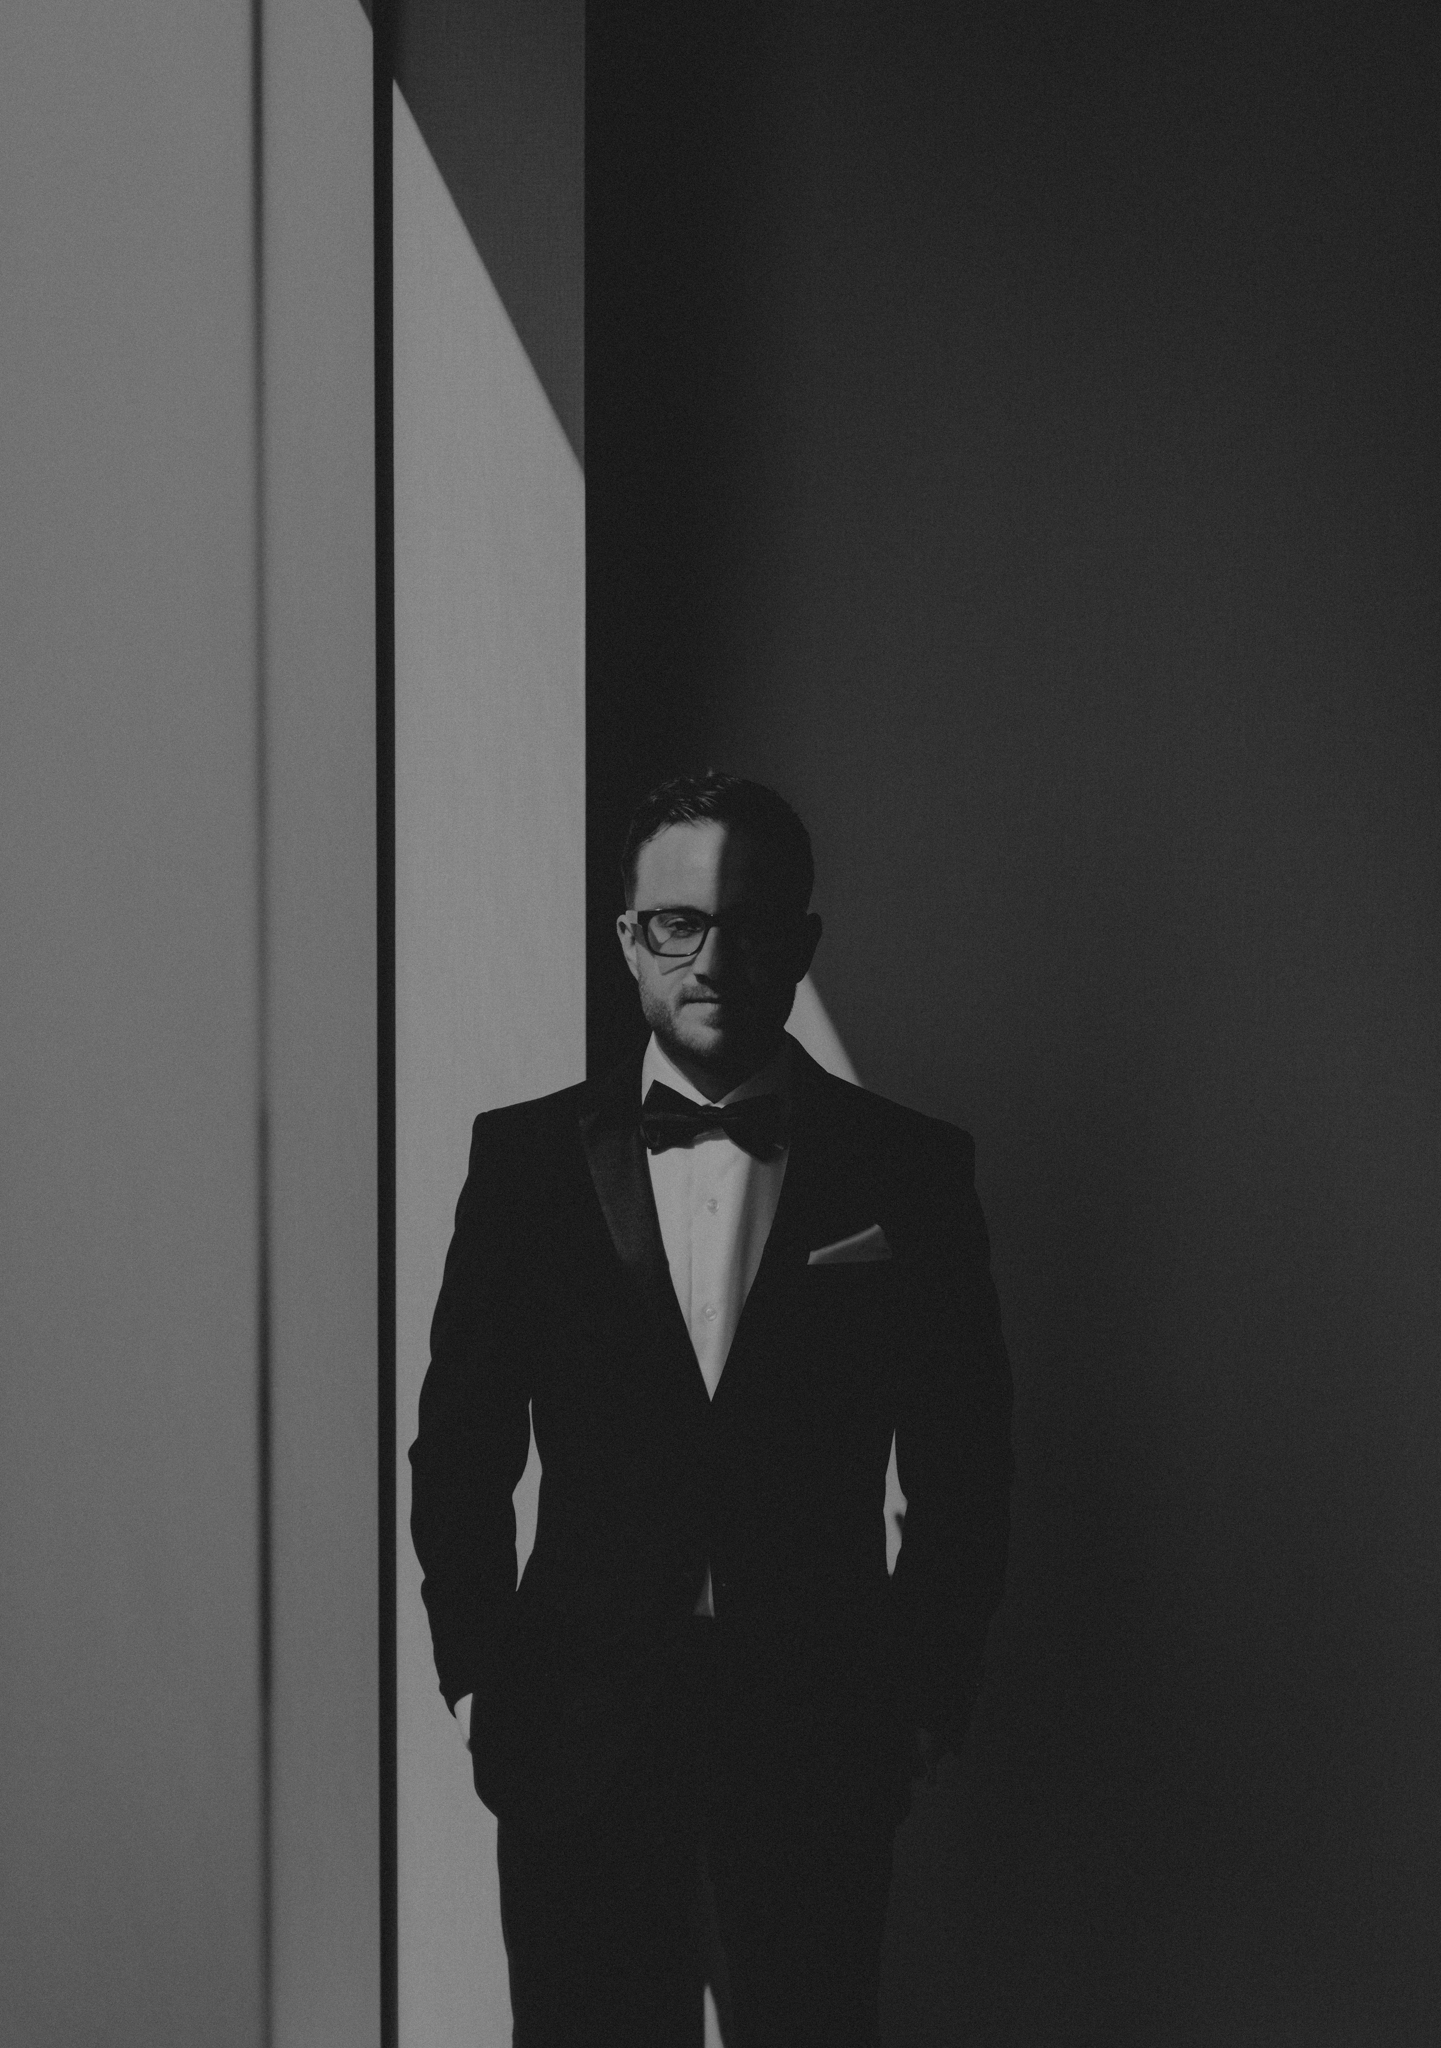 Isaiah + Taylor Photography - The Millwick Wedding, Los Angeles Photographer 2-1.jpg